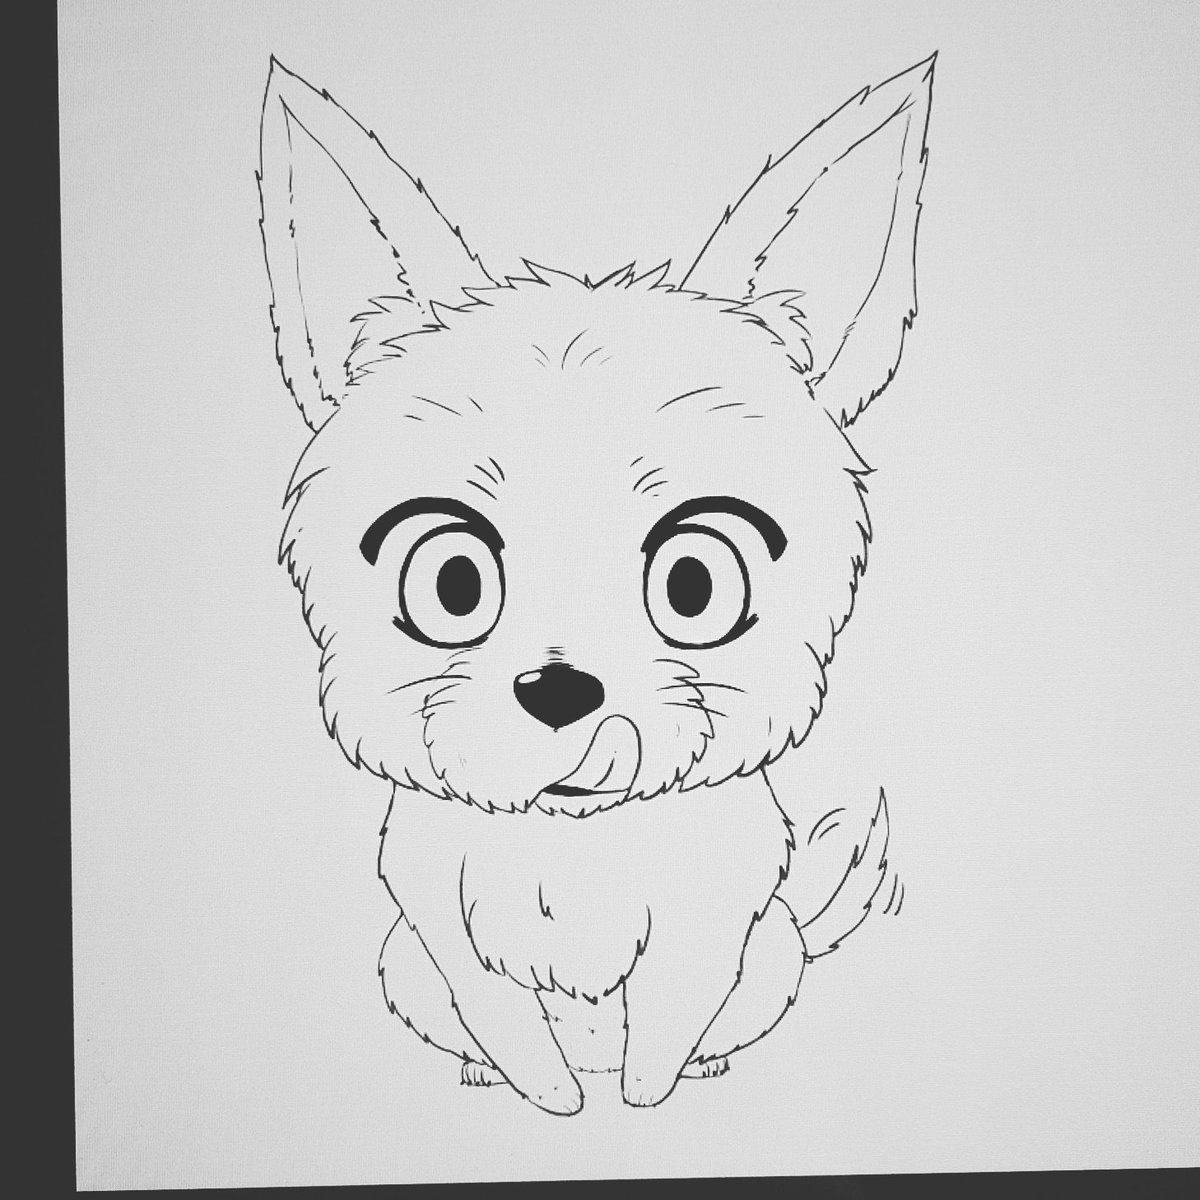 Marina094art On Twitter Preview Dog Animal Anime Manga